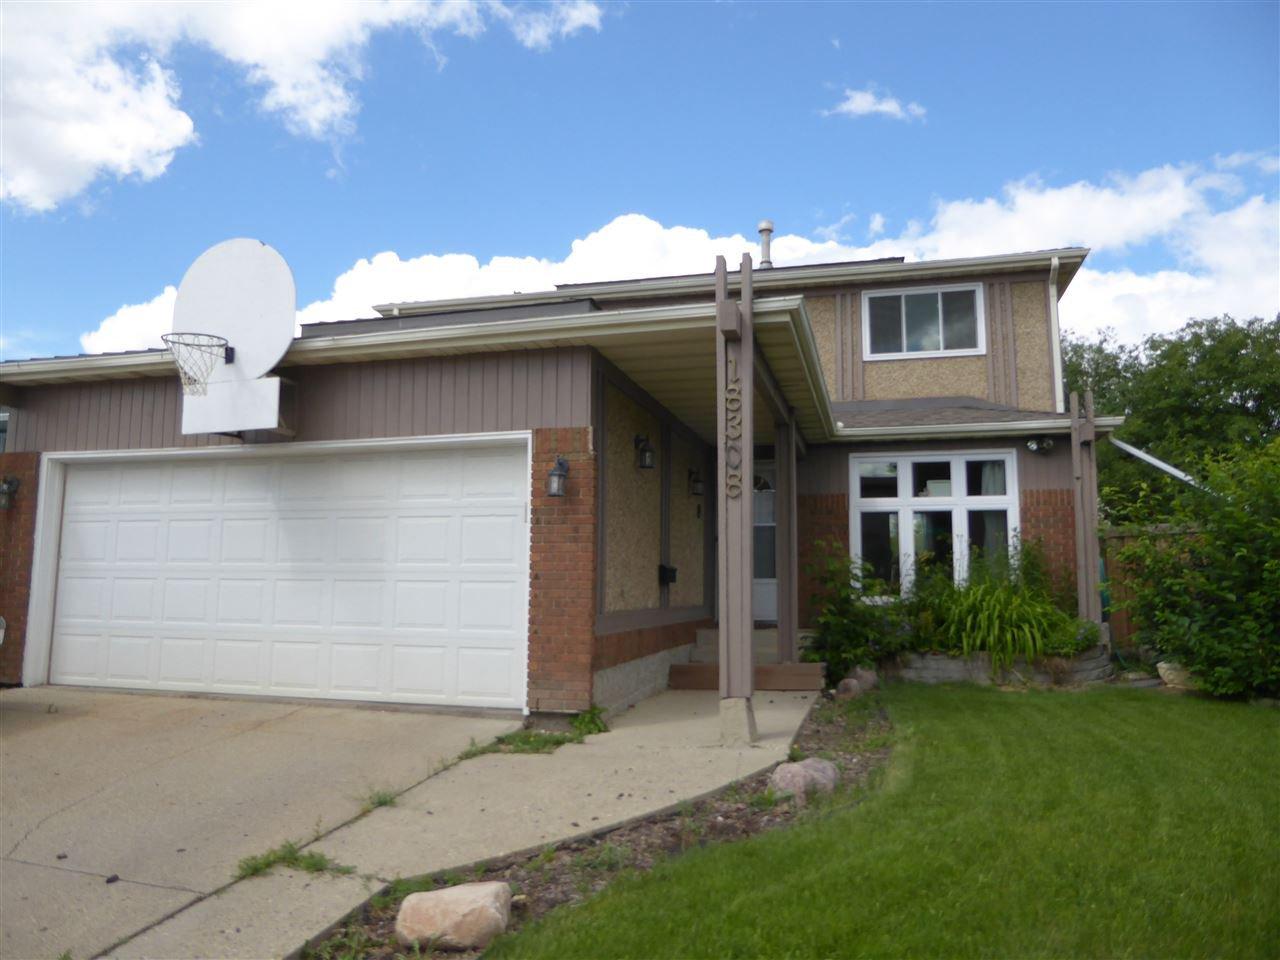 Main Photo: 18308 78 Avenue in Edmonton: Zone 20 House for sale : MLS®# E4204149